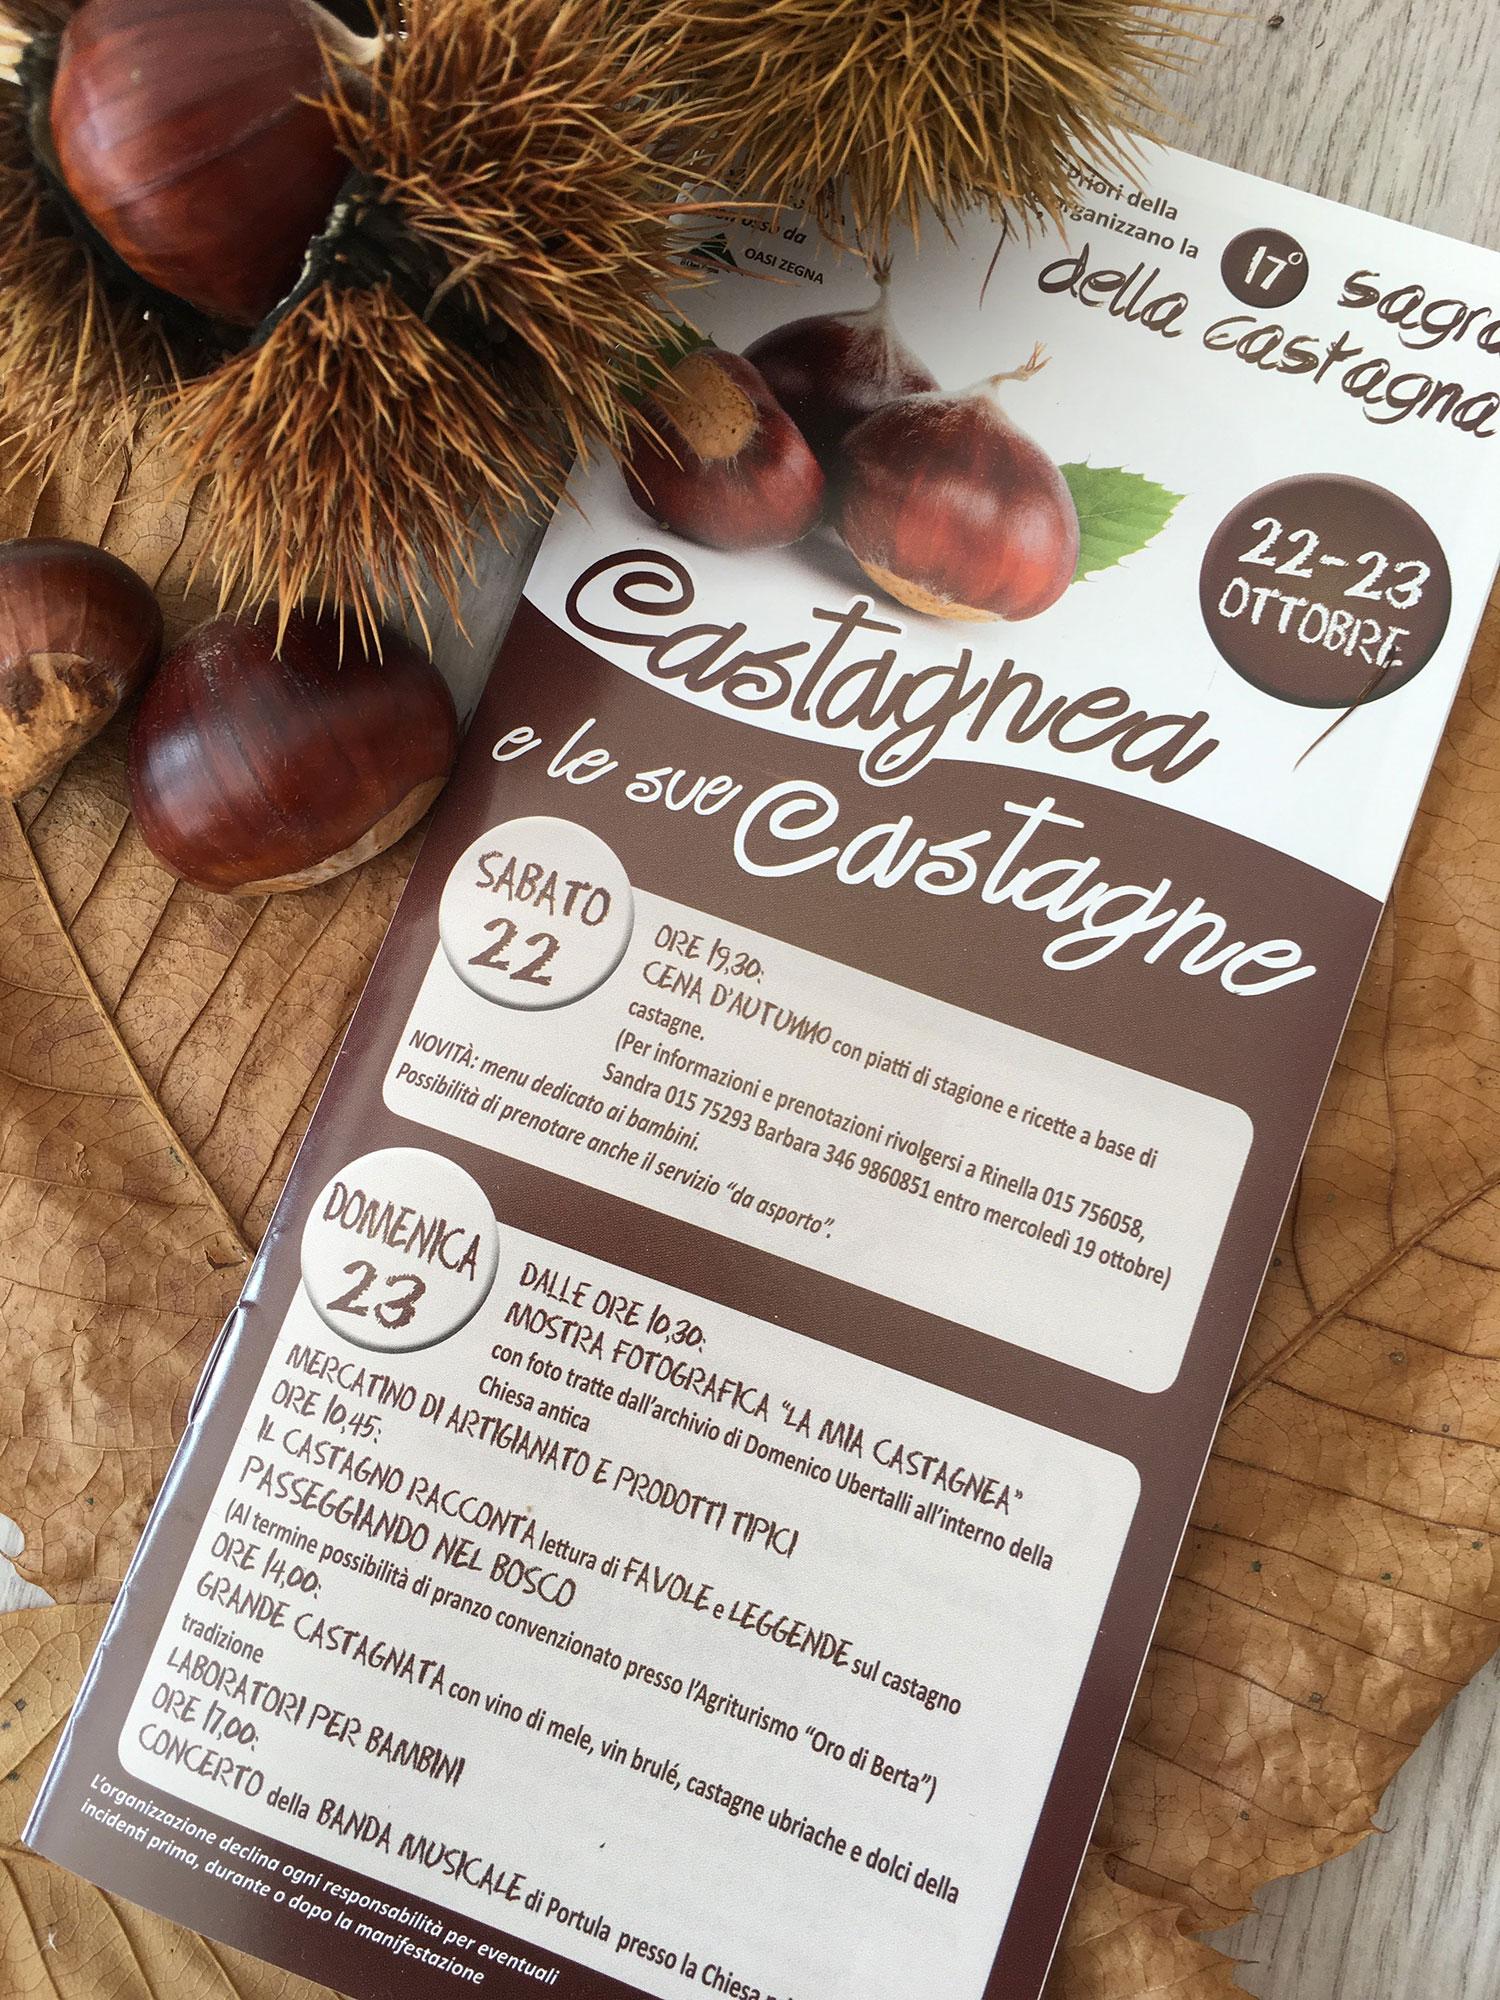 Castagnea e le Sue Castagne – Opuscoli